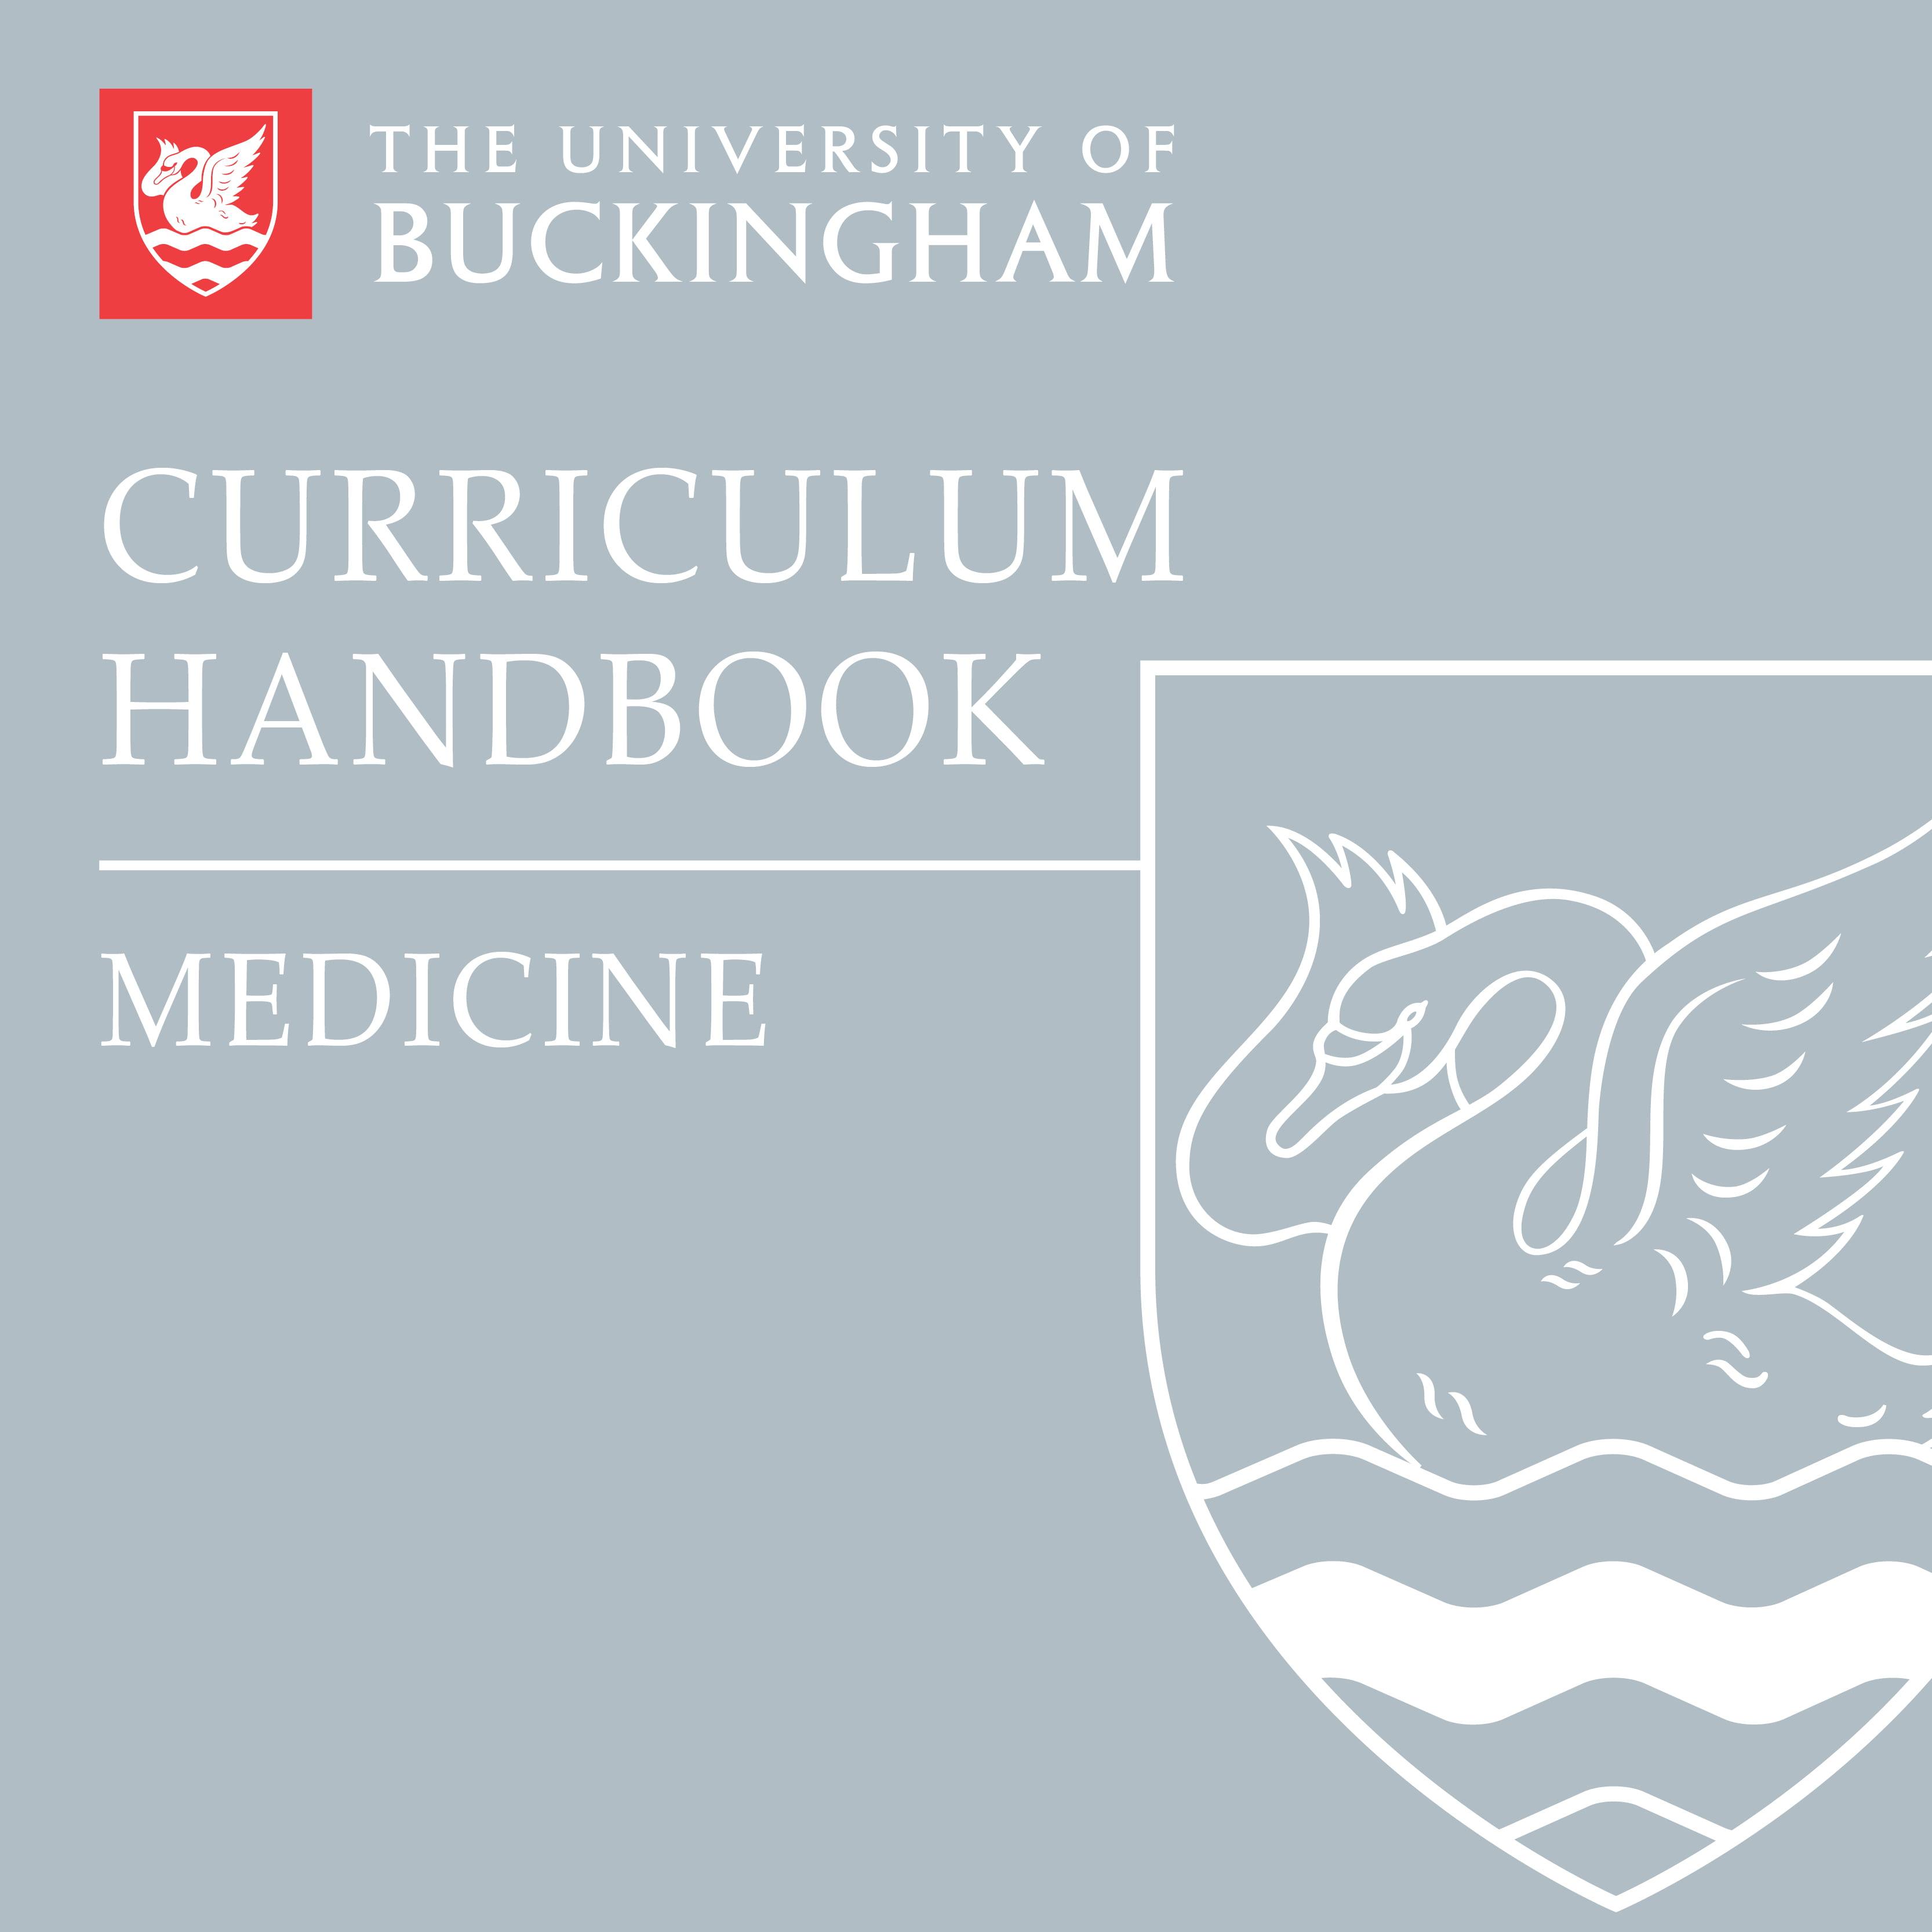 Curriculum Handbook - Medicine - front cover - online